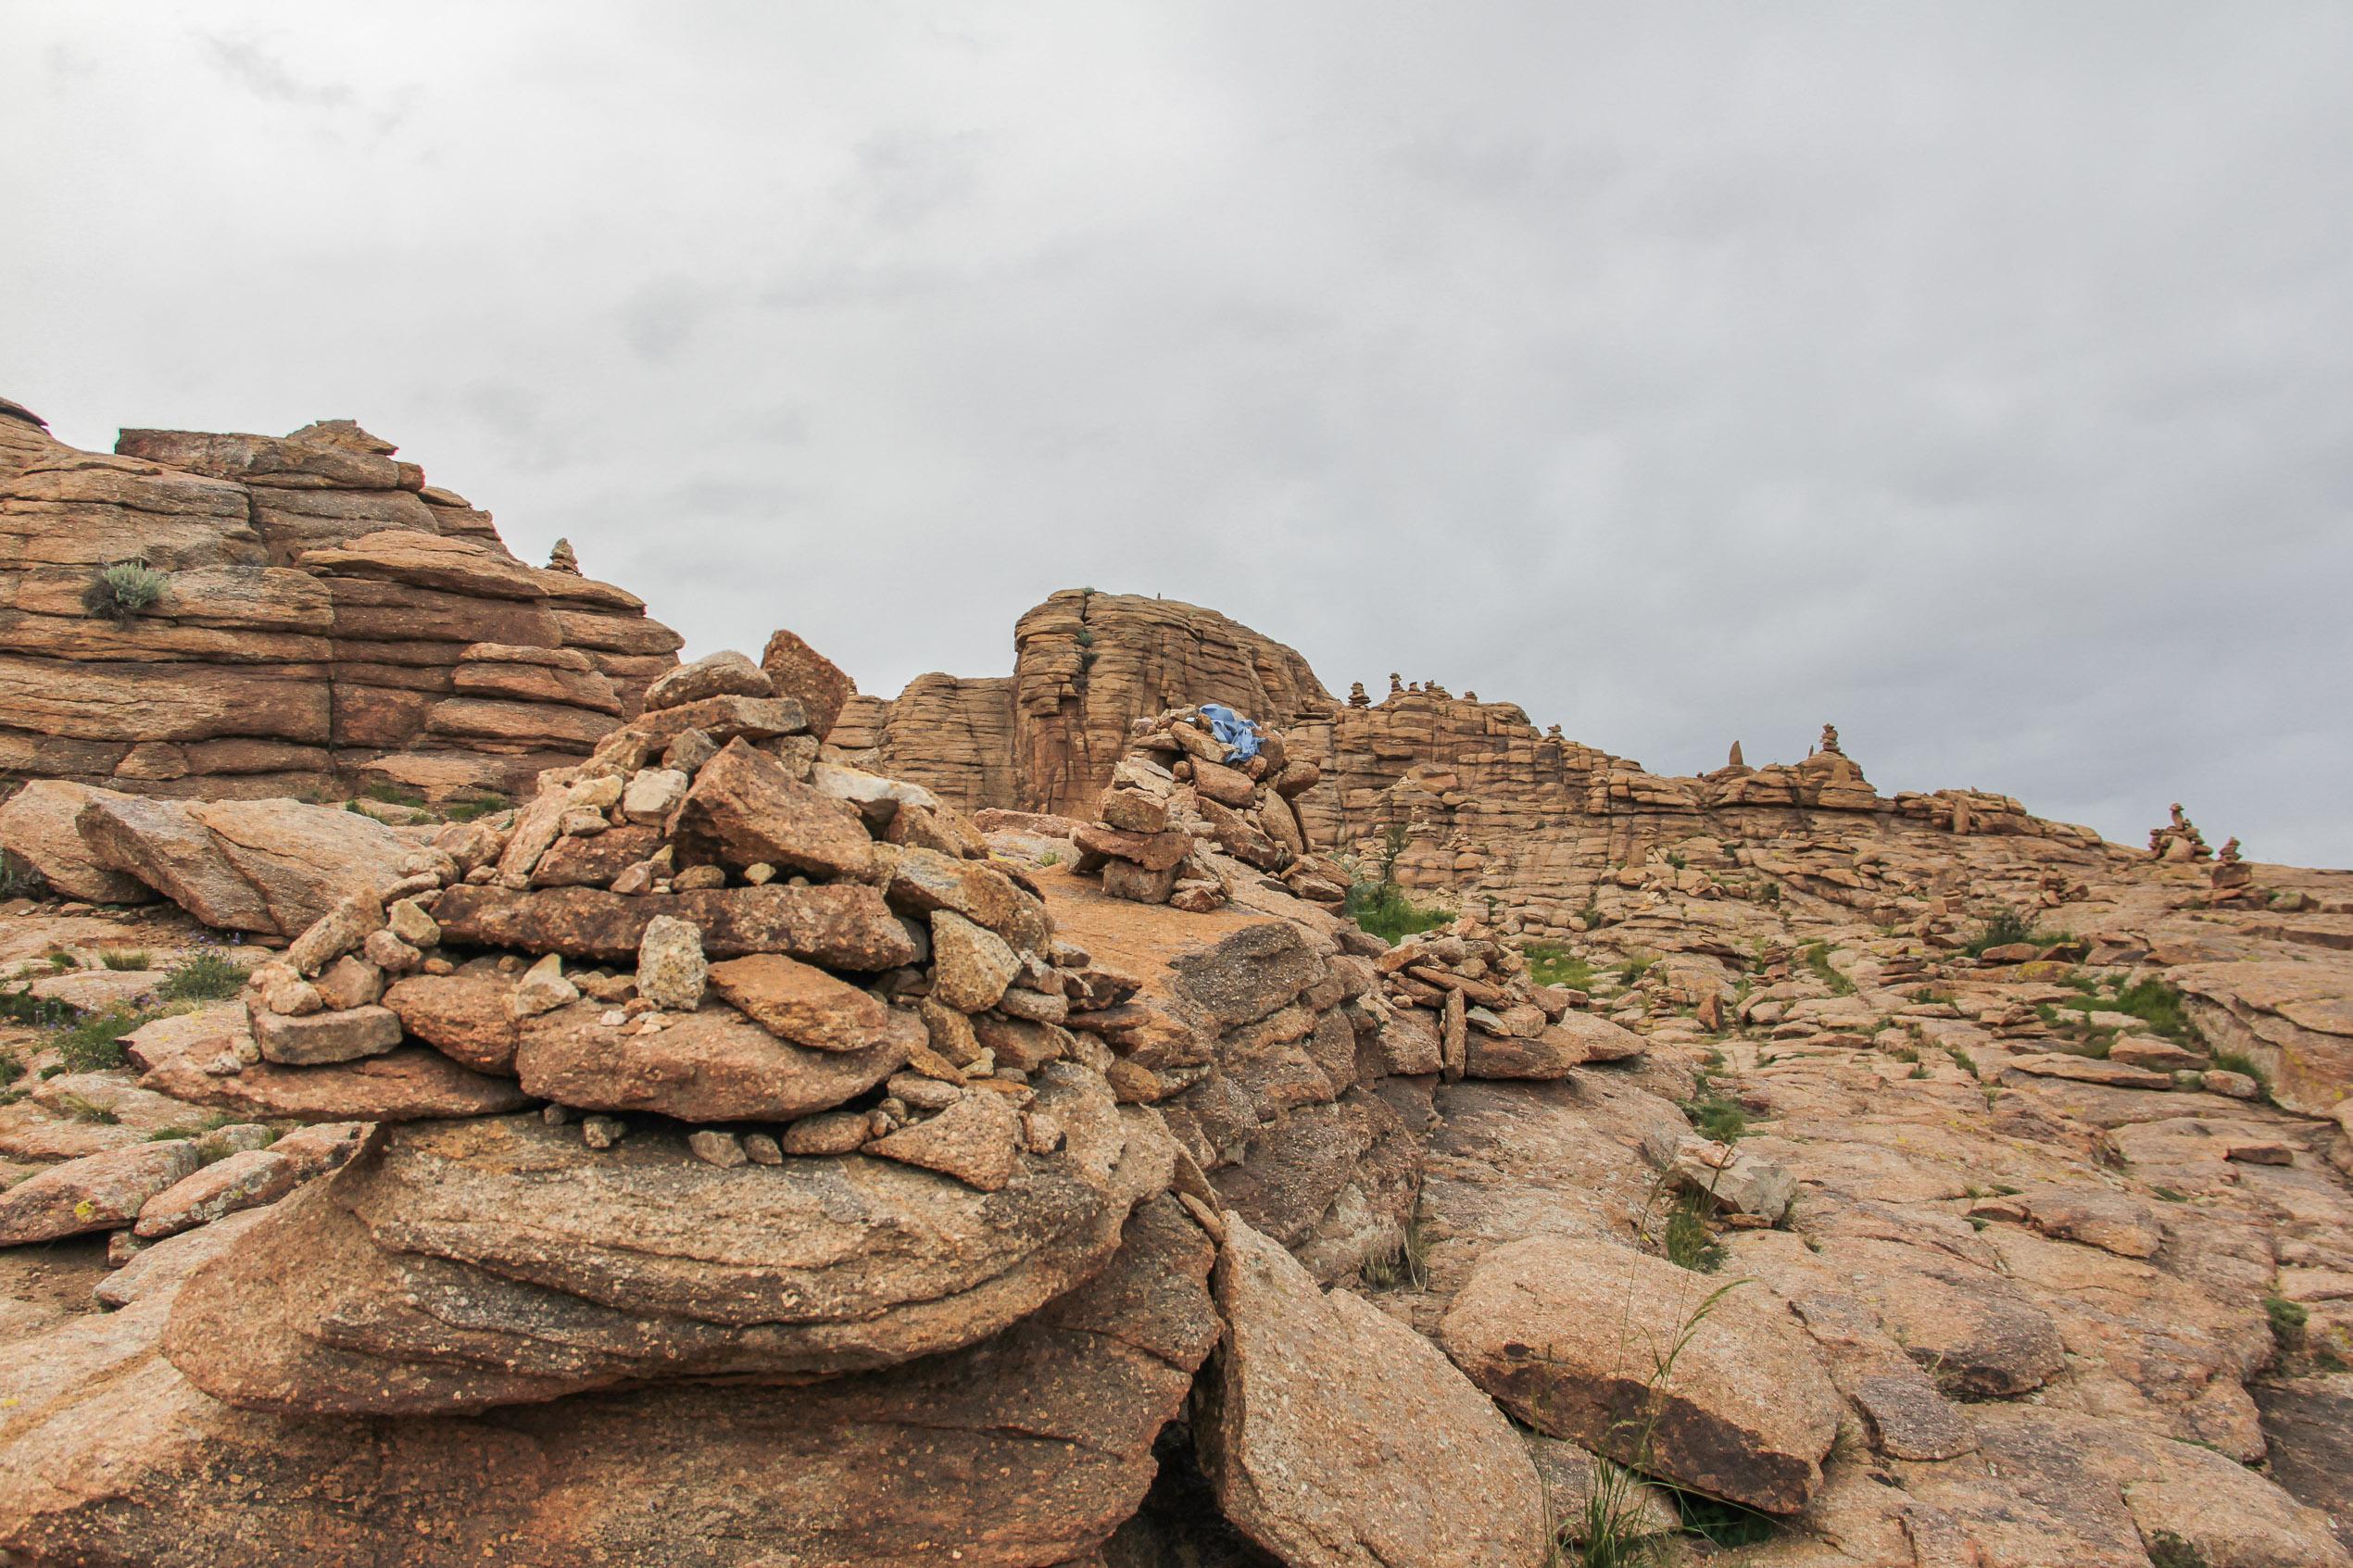 Baga Gazrum Chuluu National Park